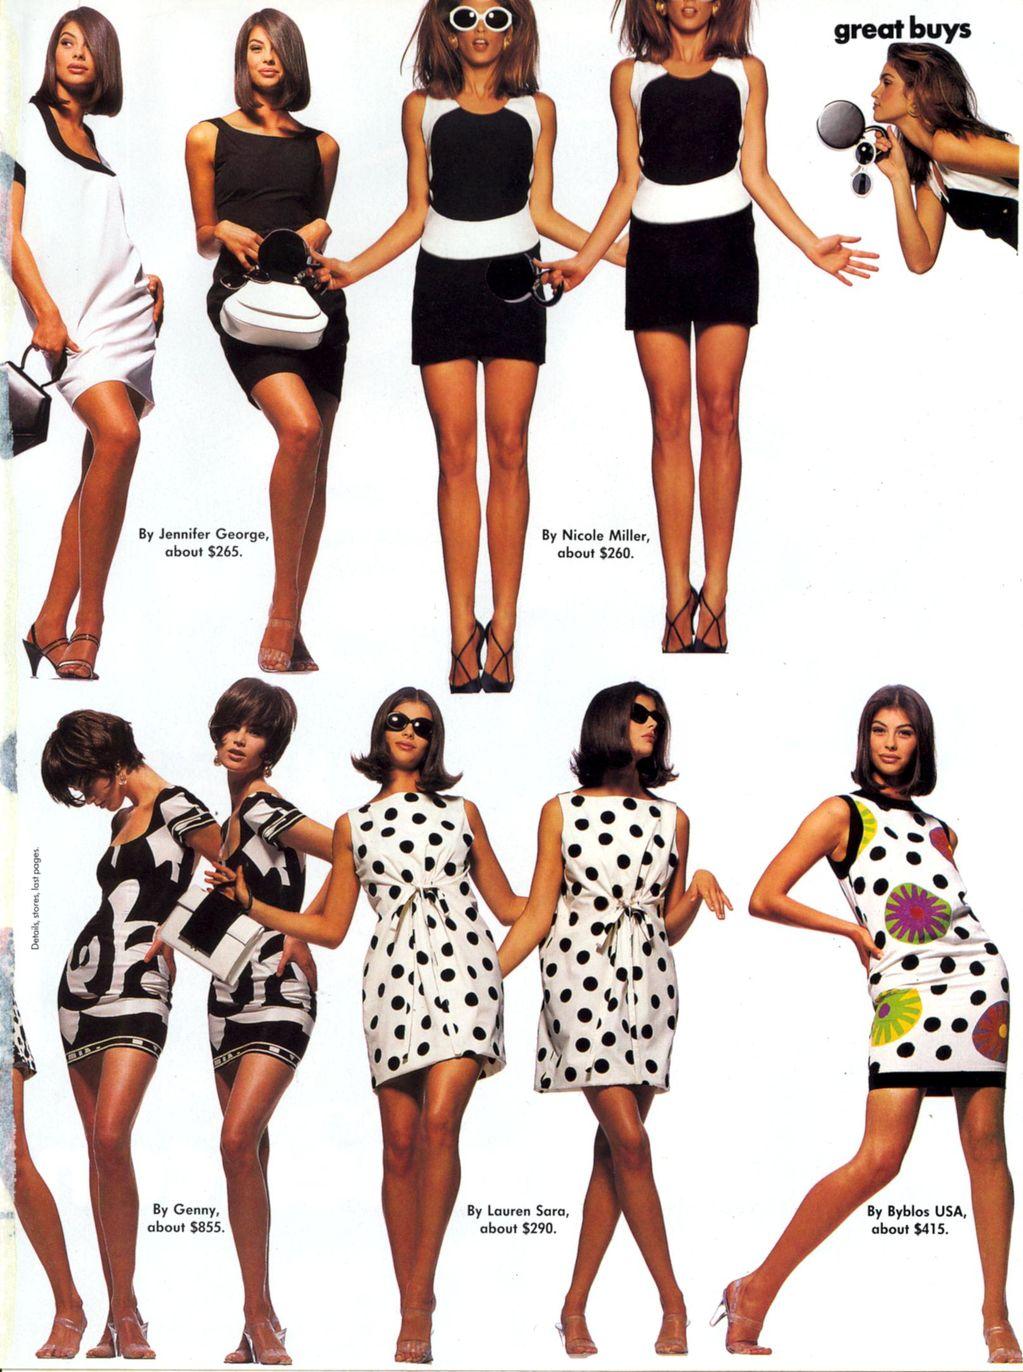 Vogue January 1991 | Great Buys - Dress Rehearsal 10.jpg